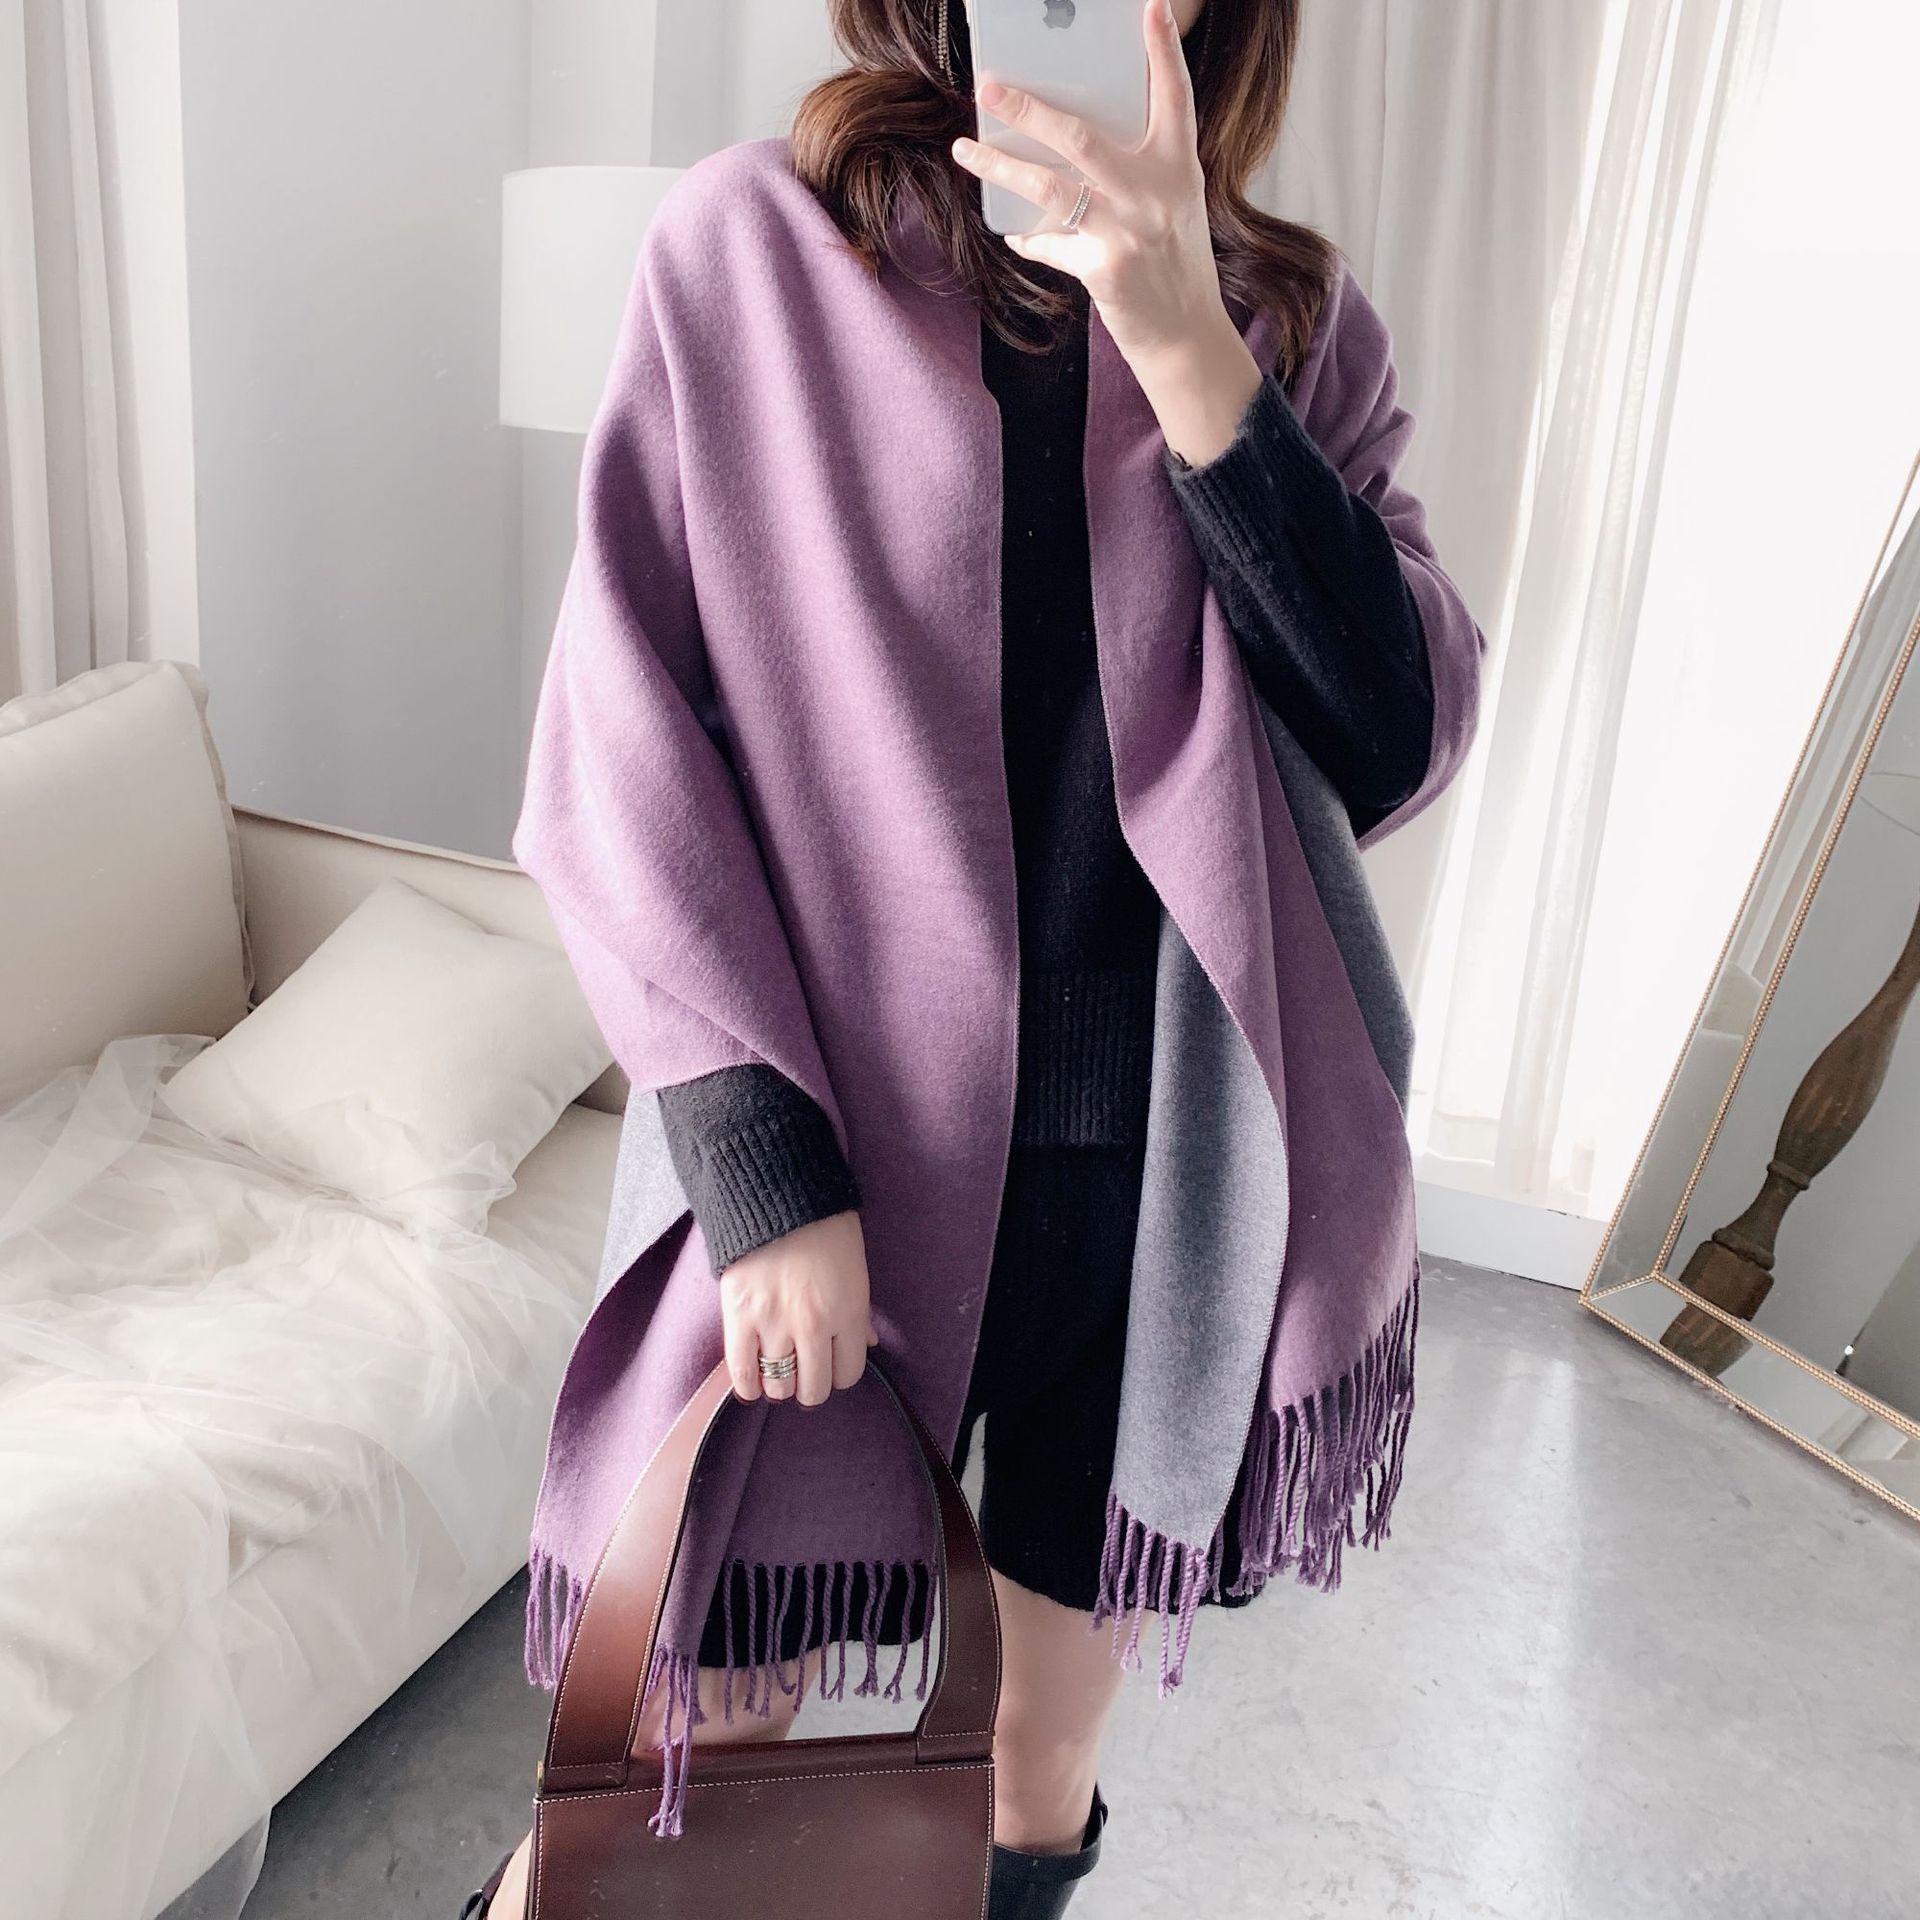 2020 Luxury Pure Cashmere Scarf For Women Solid Warm Pashmina Scarves Tassel Double Sides Scarfs Shawls Wraps Lady Bandana